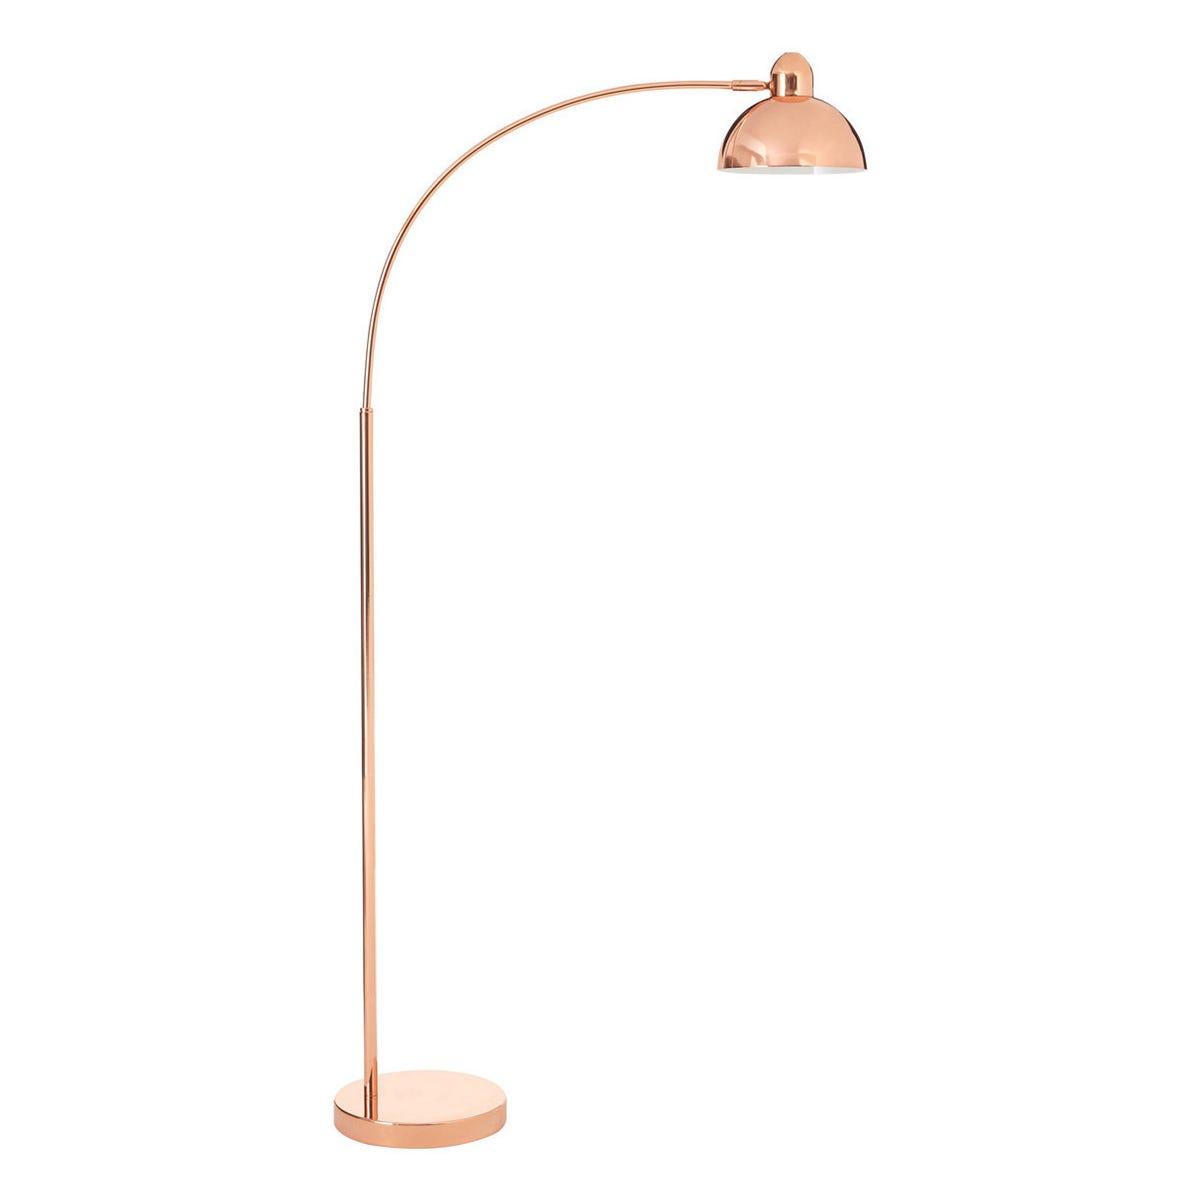 Interiors By Premier Floor Lamp - Copper